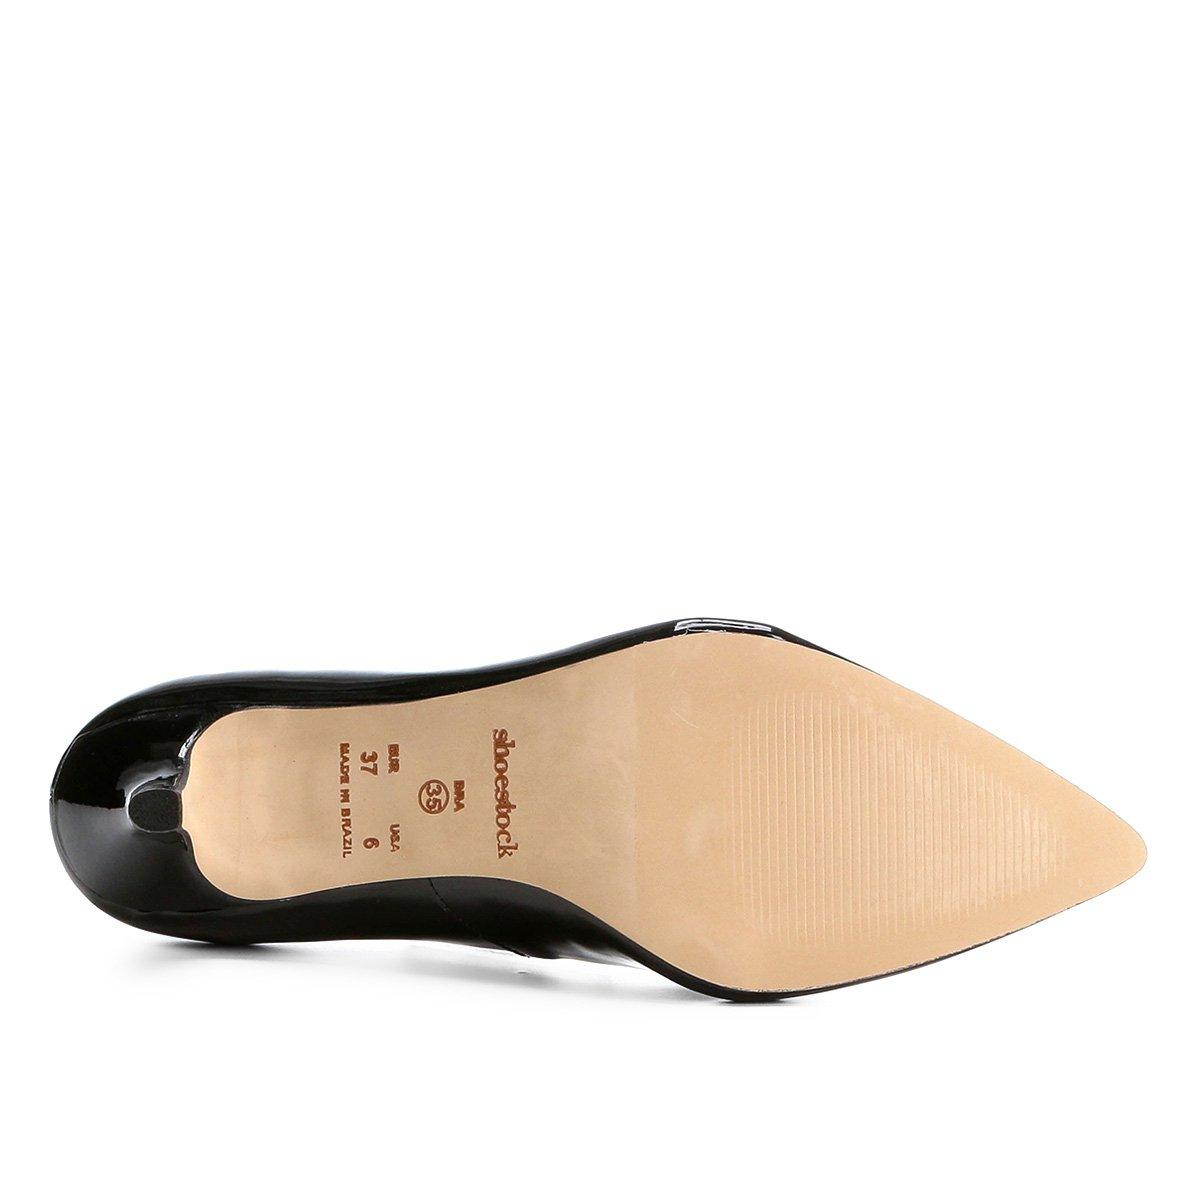 Verniz Baixo Salto Scarpin Preto Shoestock Shoestock Salto Scarpin nWY74wHHvq